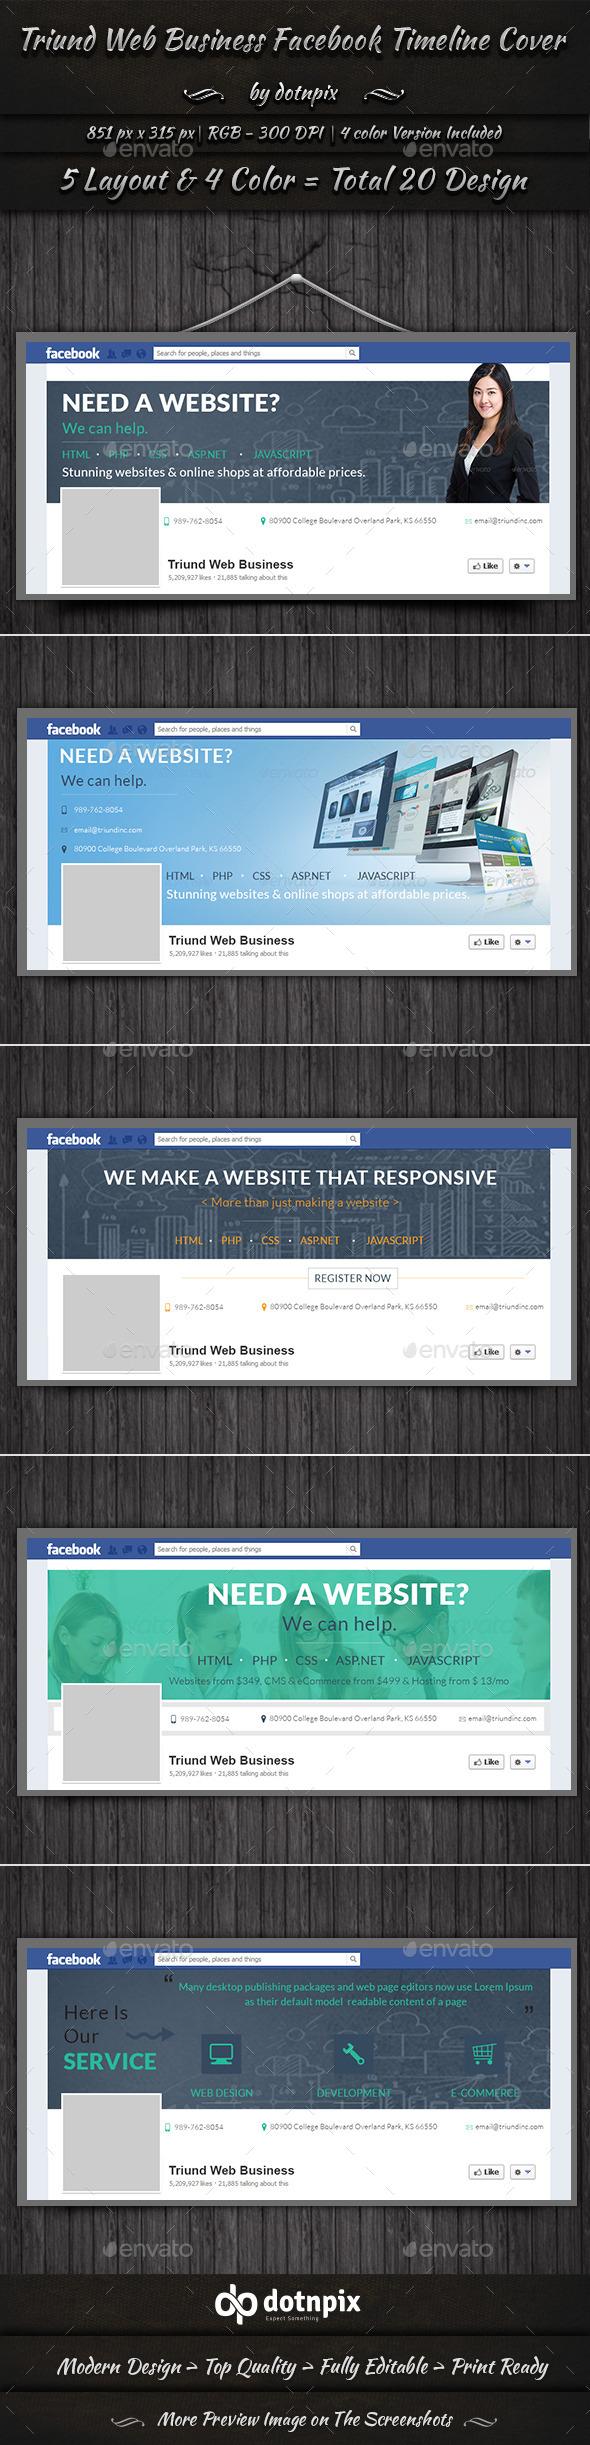 Triund Web Business Facebook Timeline Cover